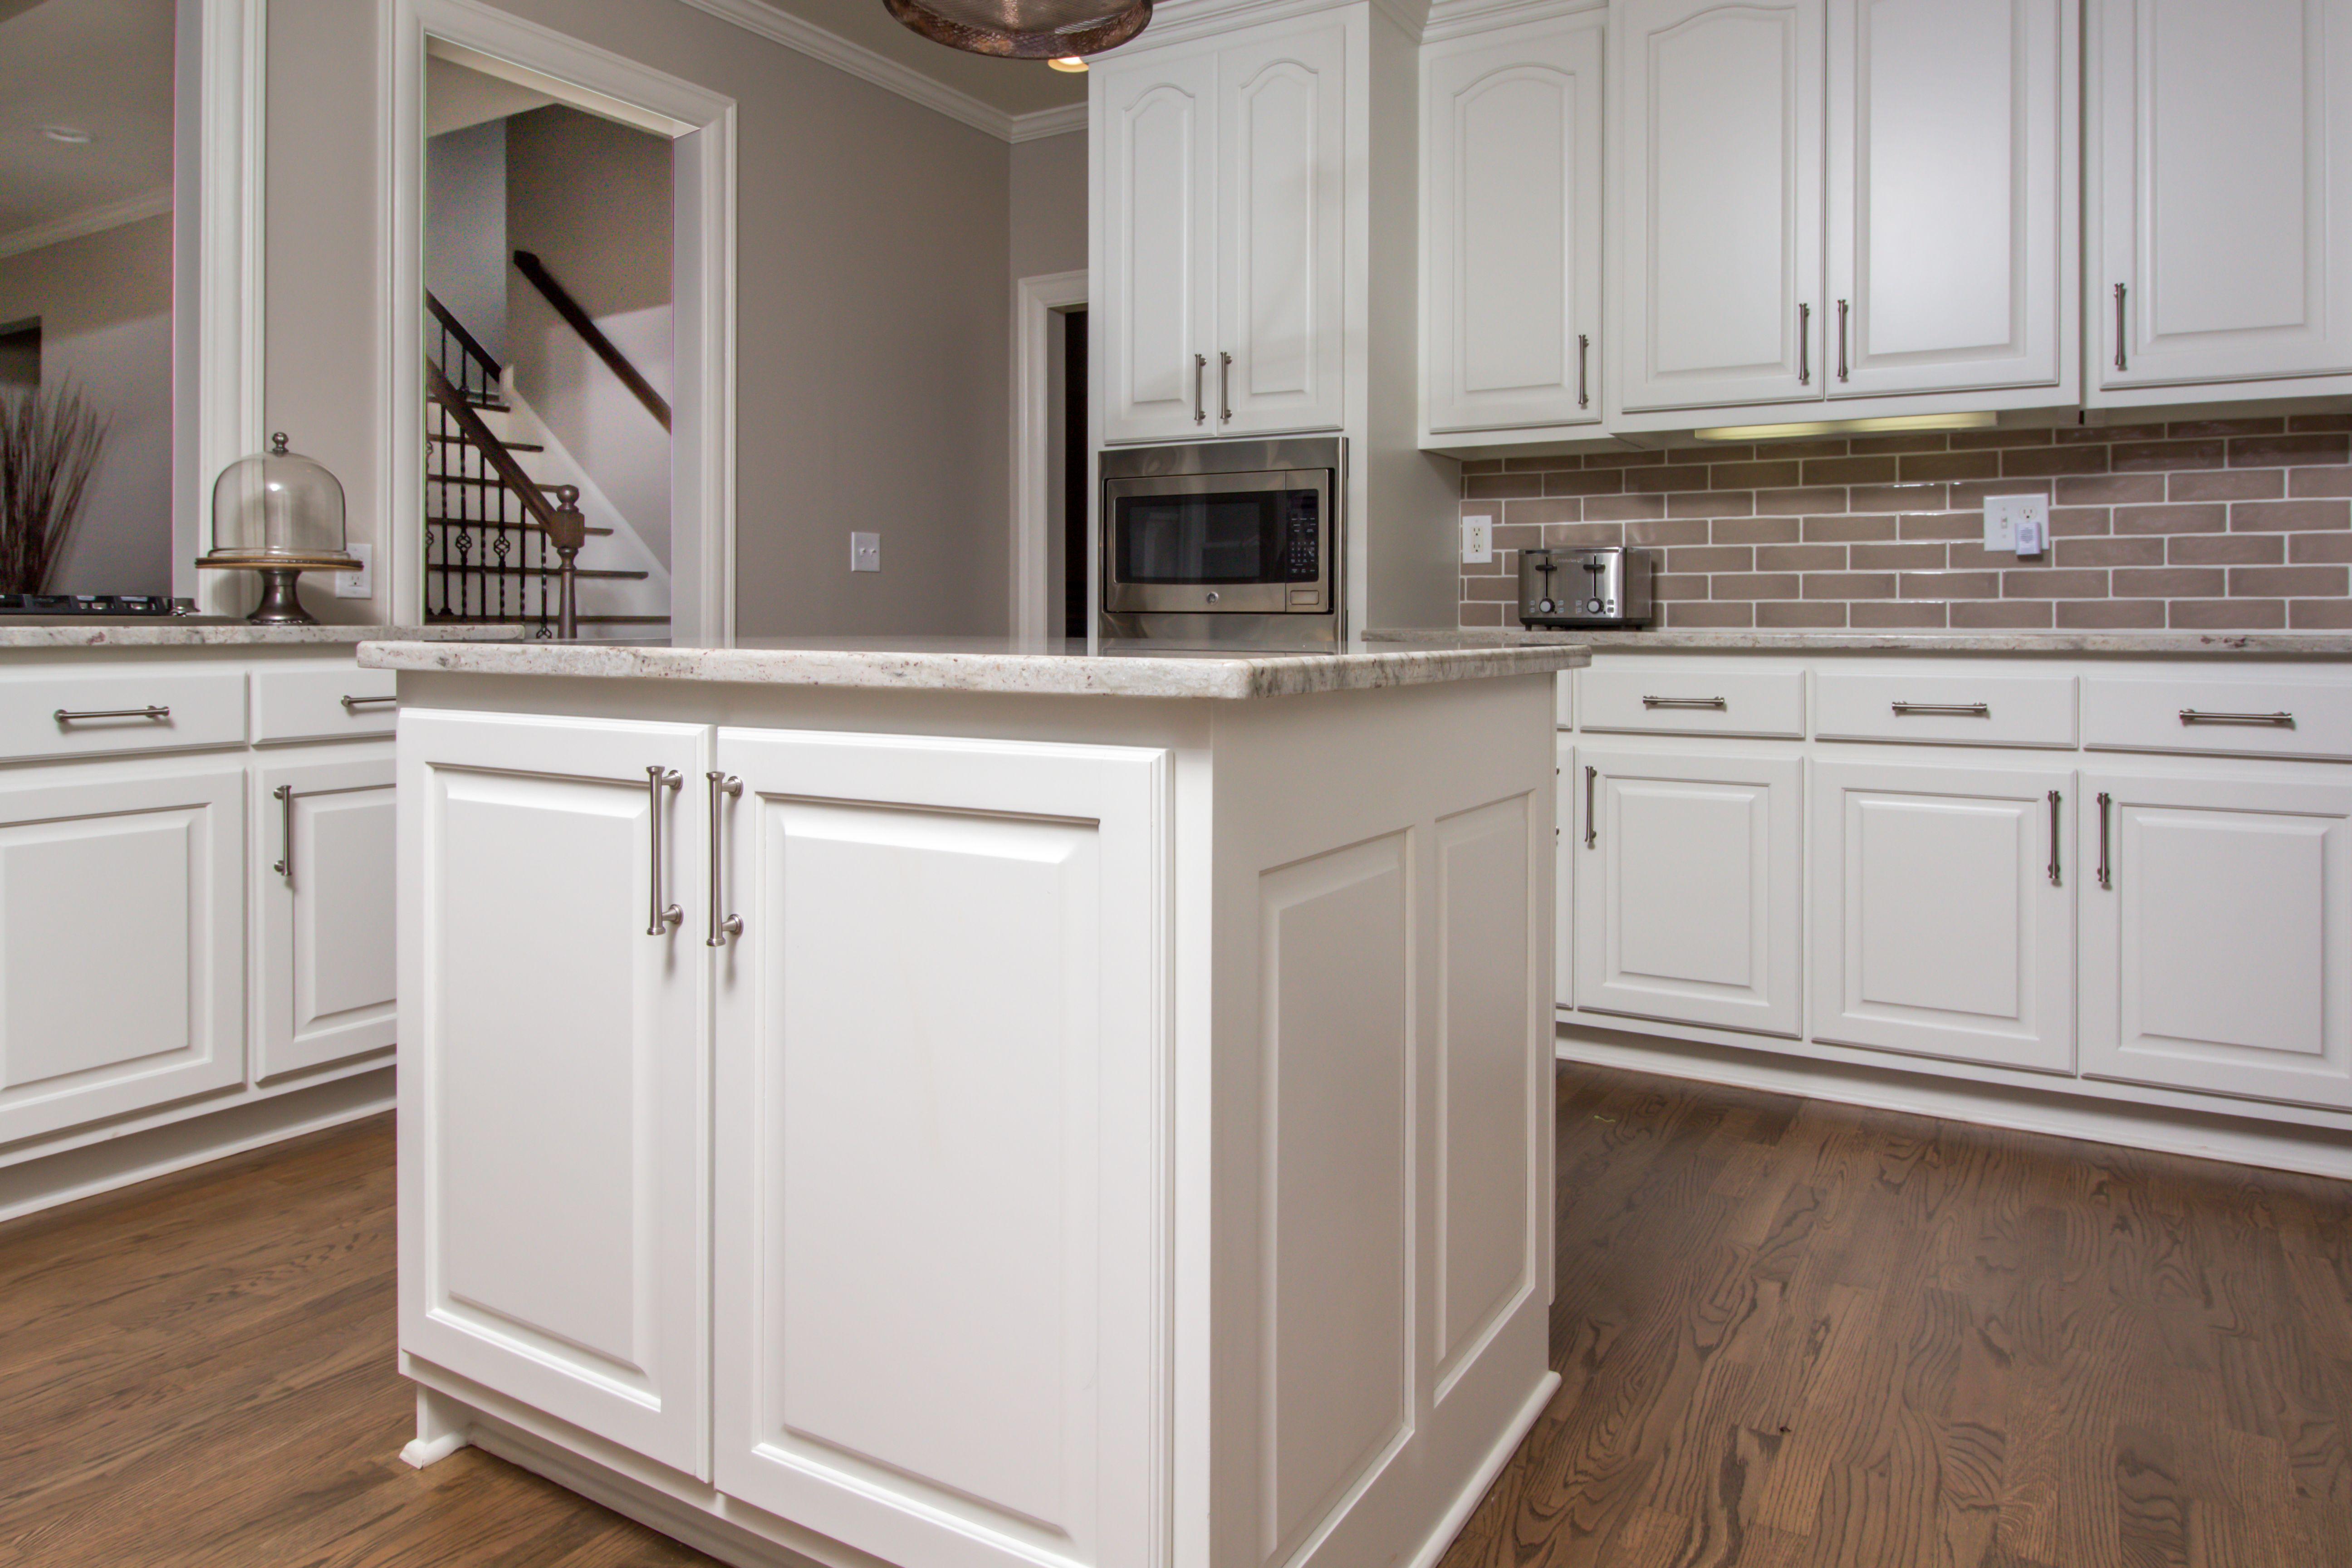 Bright White Raised Panel Island With Granite Countertops And A Subway Backsplash Kitchen Design Beautiful Kitchens Granite Countertops